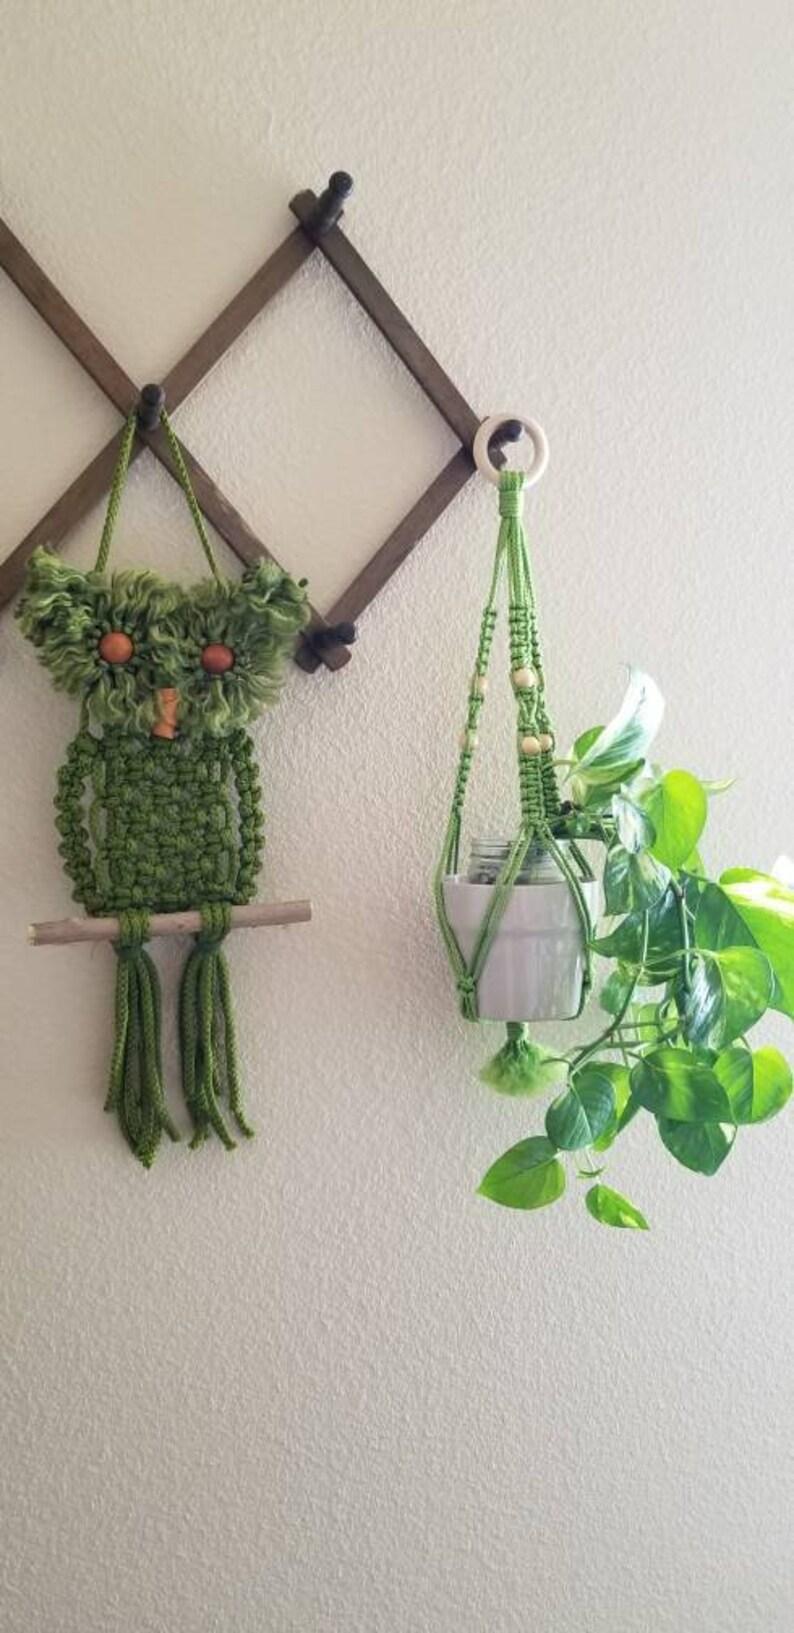 Handmade Gift Macrame Plant Hanger BOHO Vintage Green Macrame